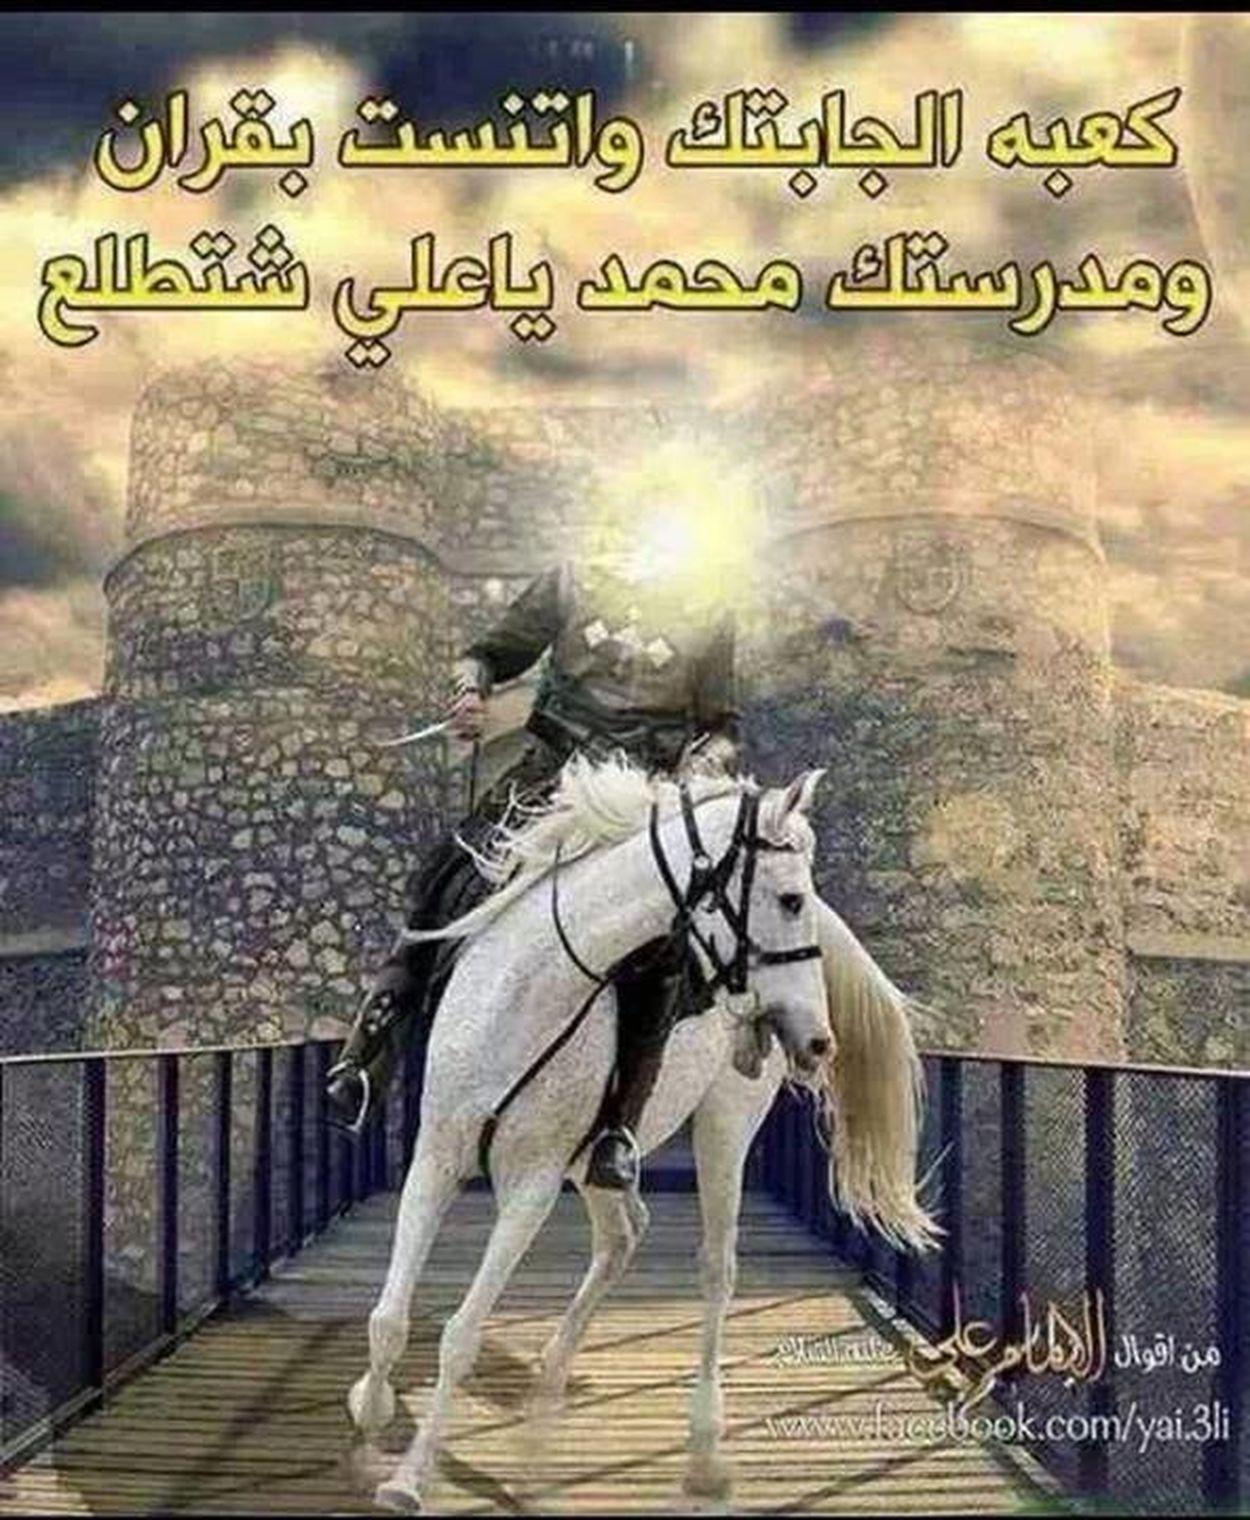 Imam Ali Bin Abi Talib Imam Ali ARABIAN OOO...